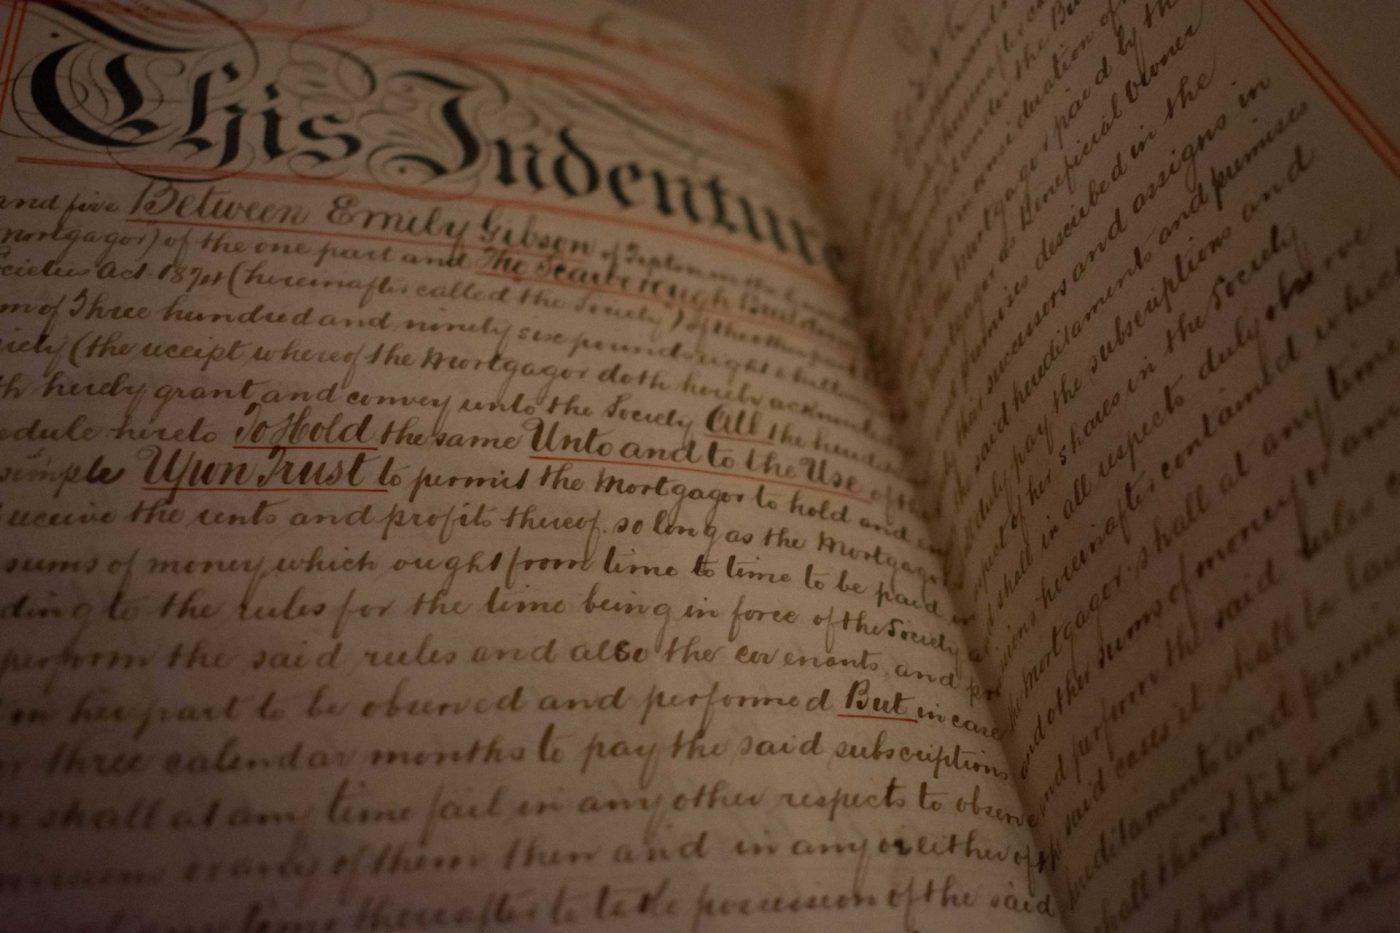 Leagle Document in Cursive Handwriting